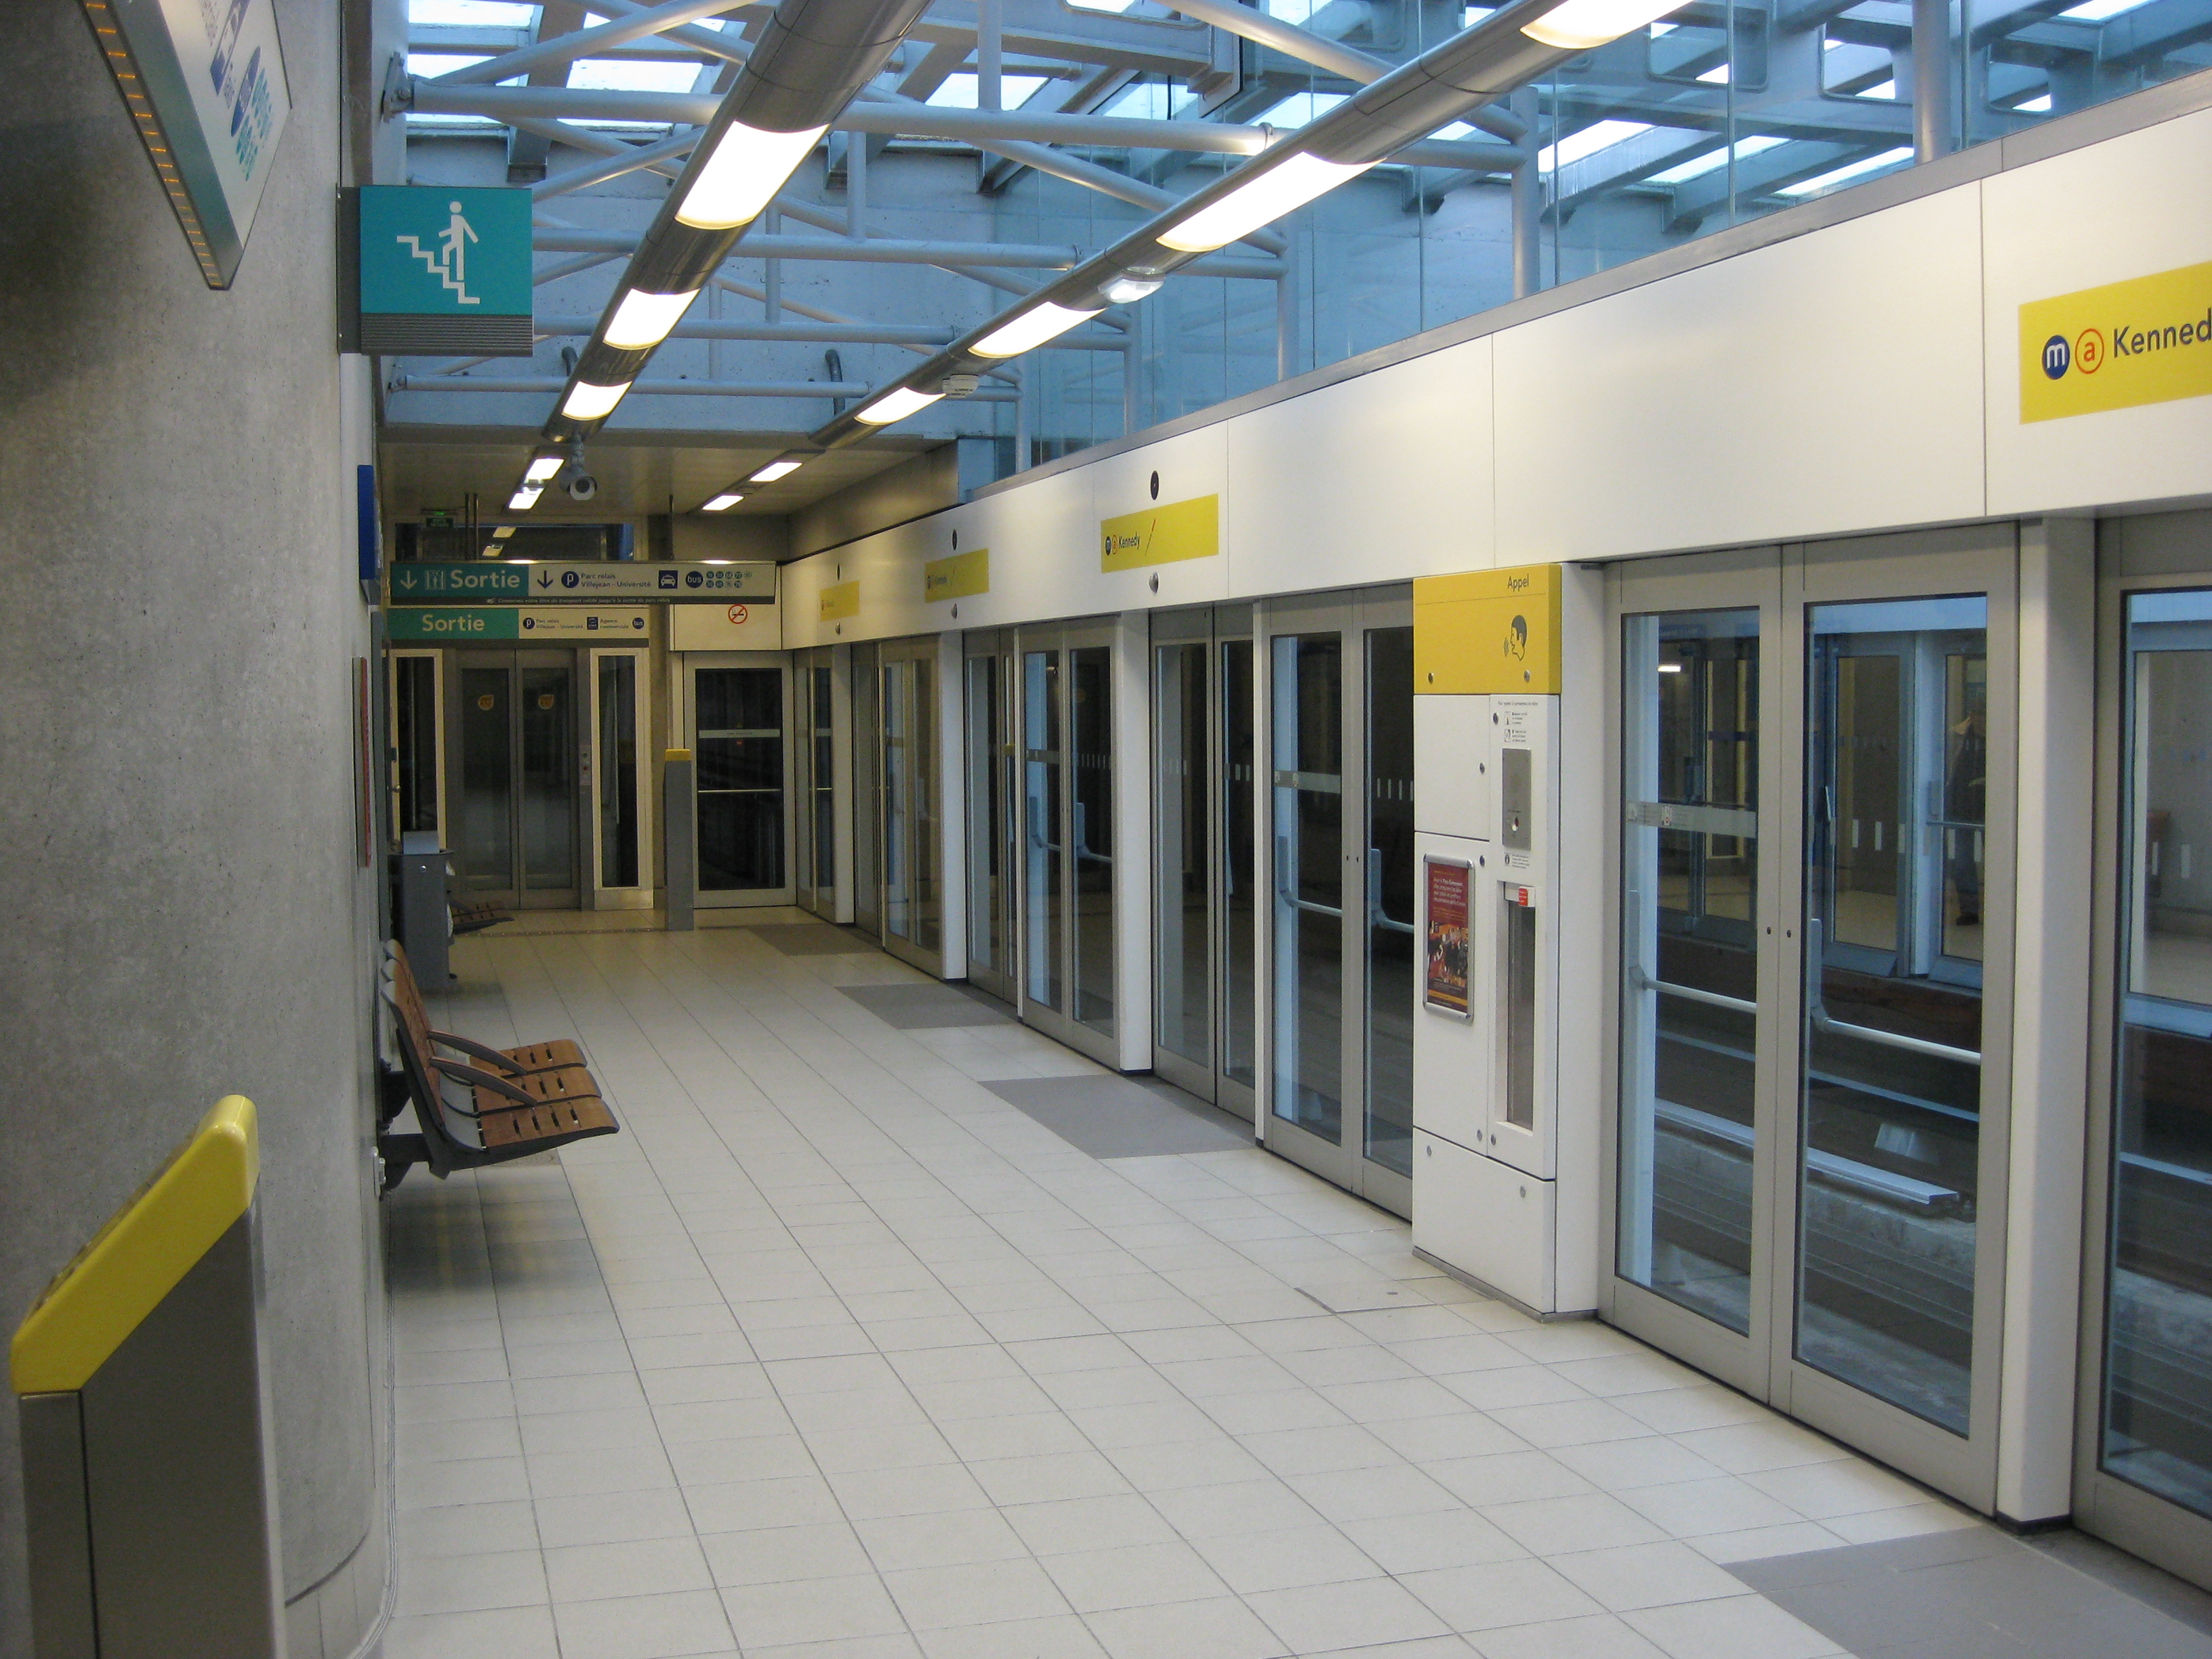 file m tro rennes station villejean jpg wikimedia commons. Black Bedroom Furniture Sets. Home Design Ideas